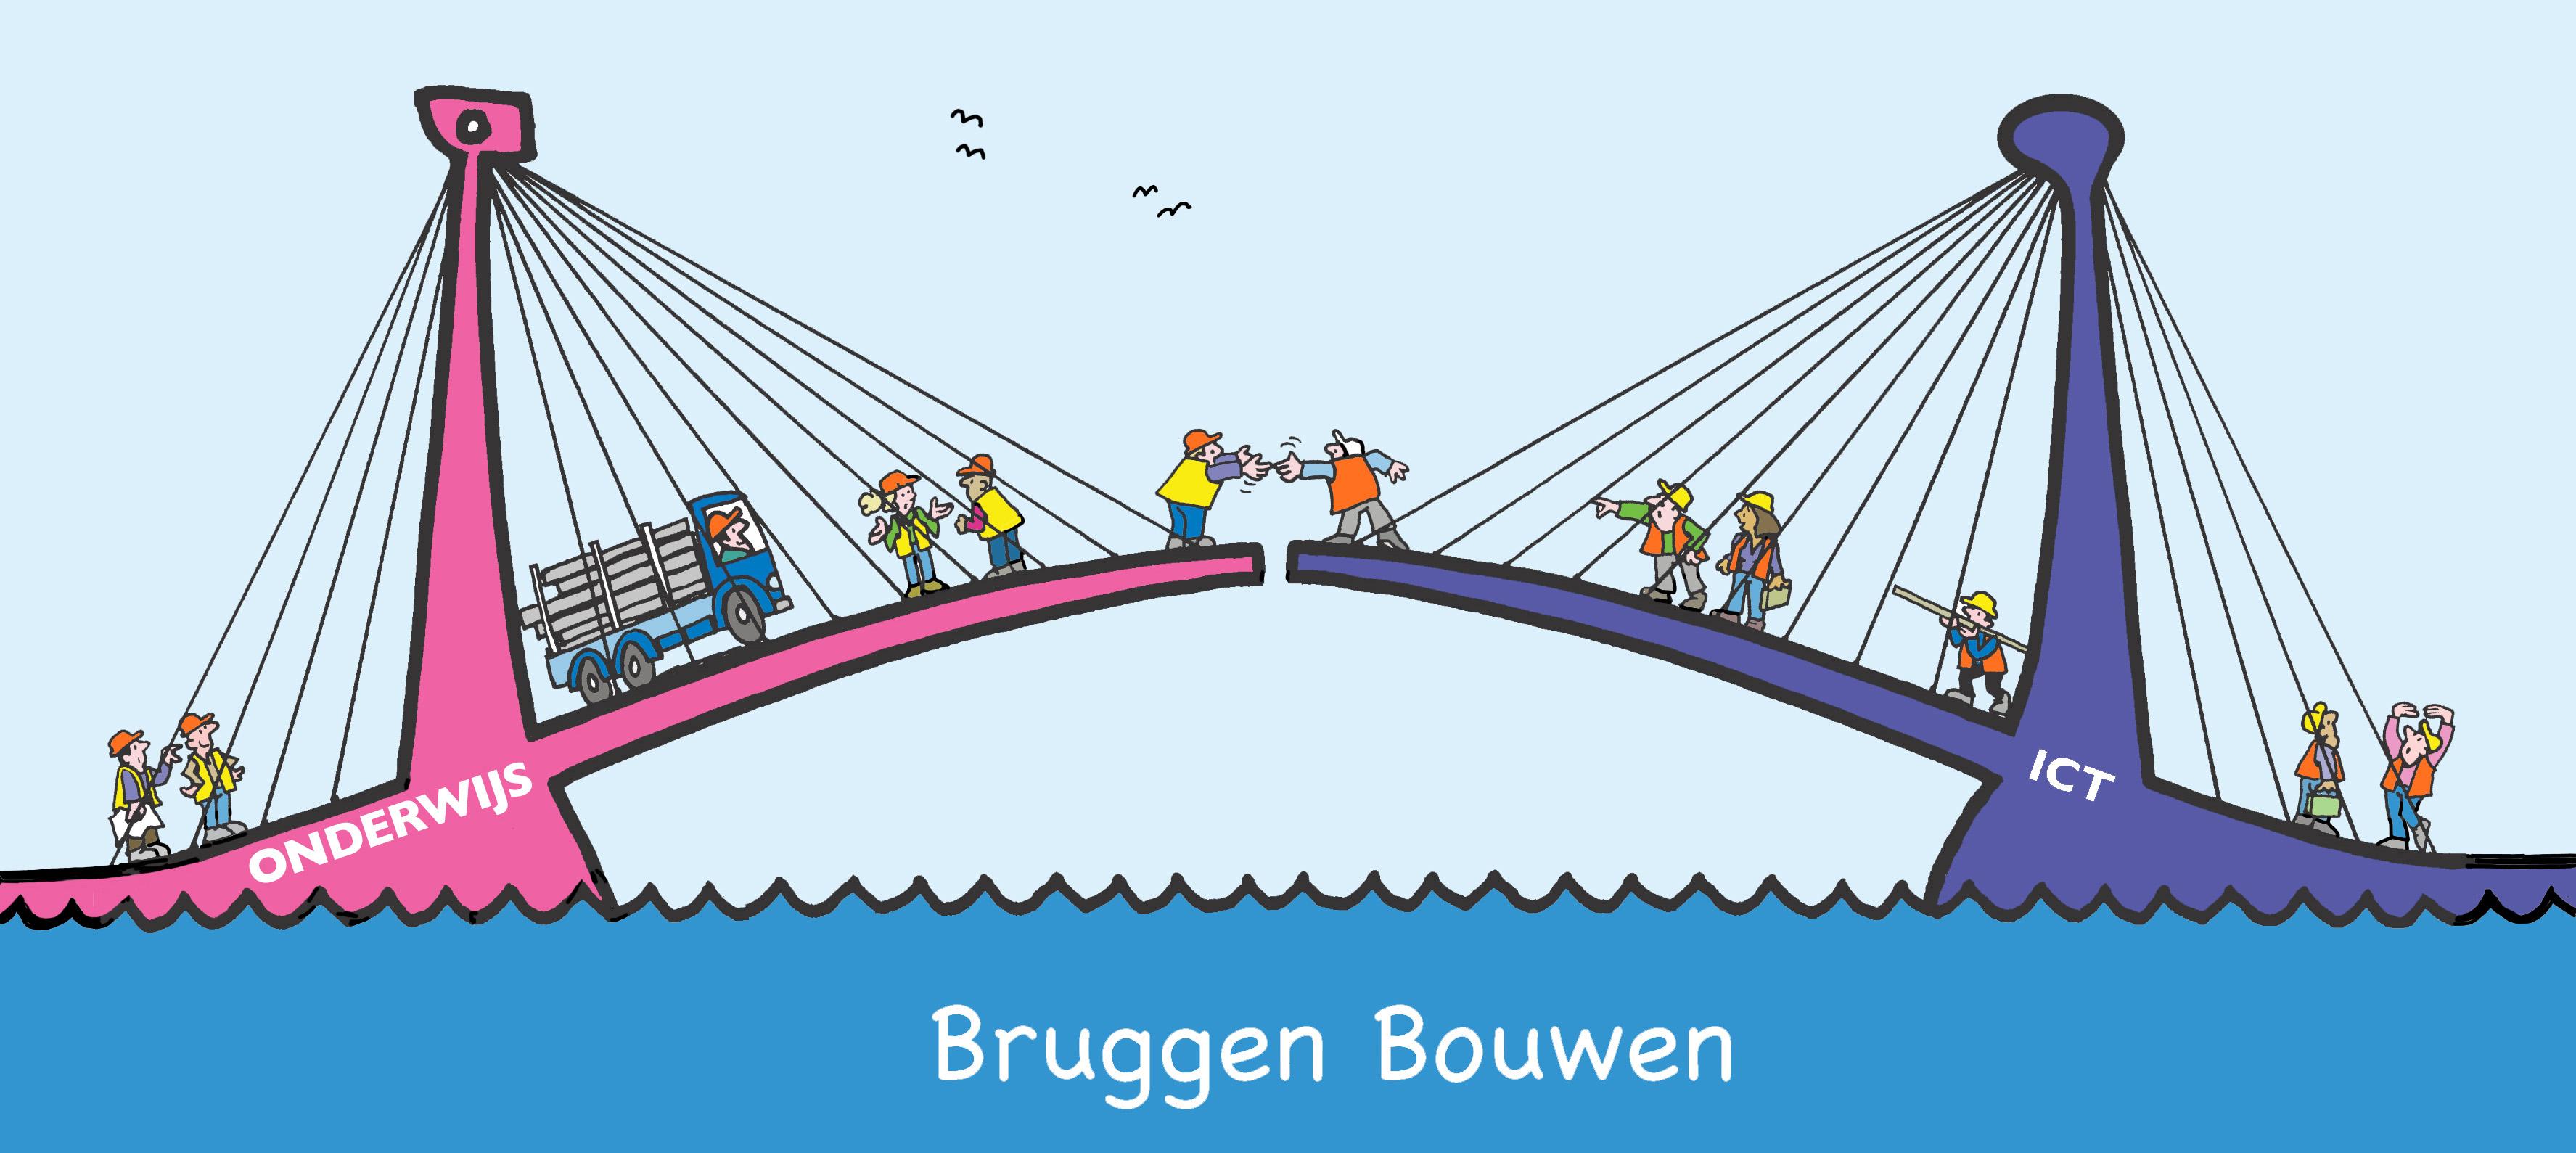 Bruggen Bouwen: Masterclass en Peergang